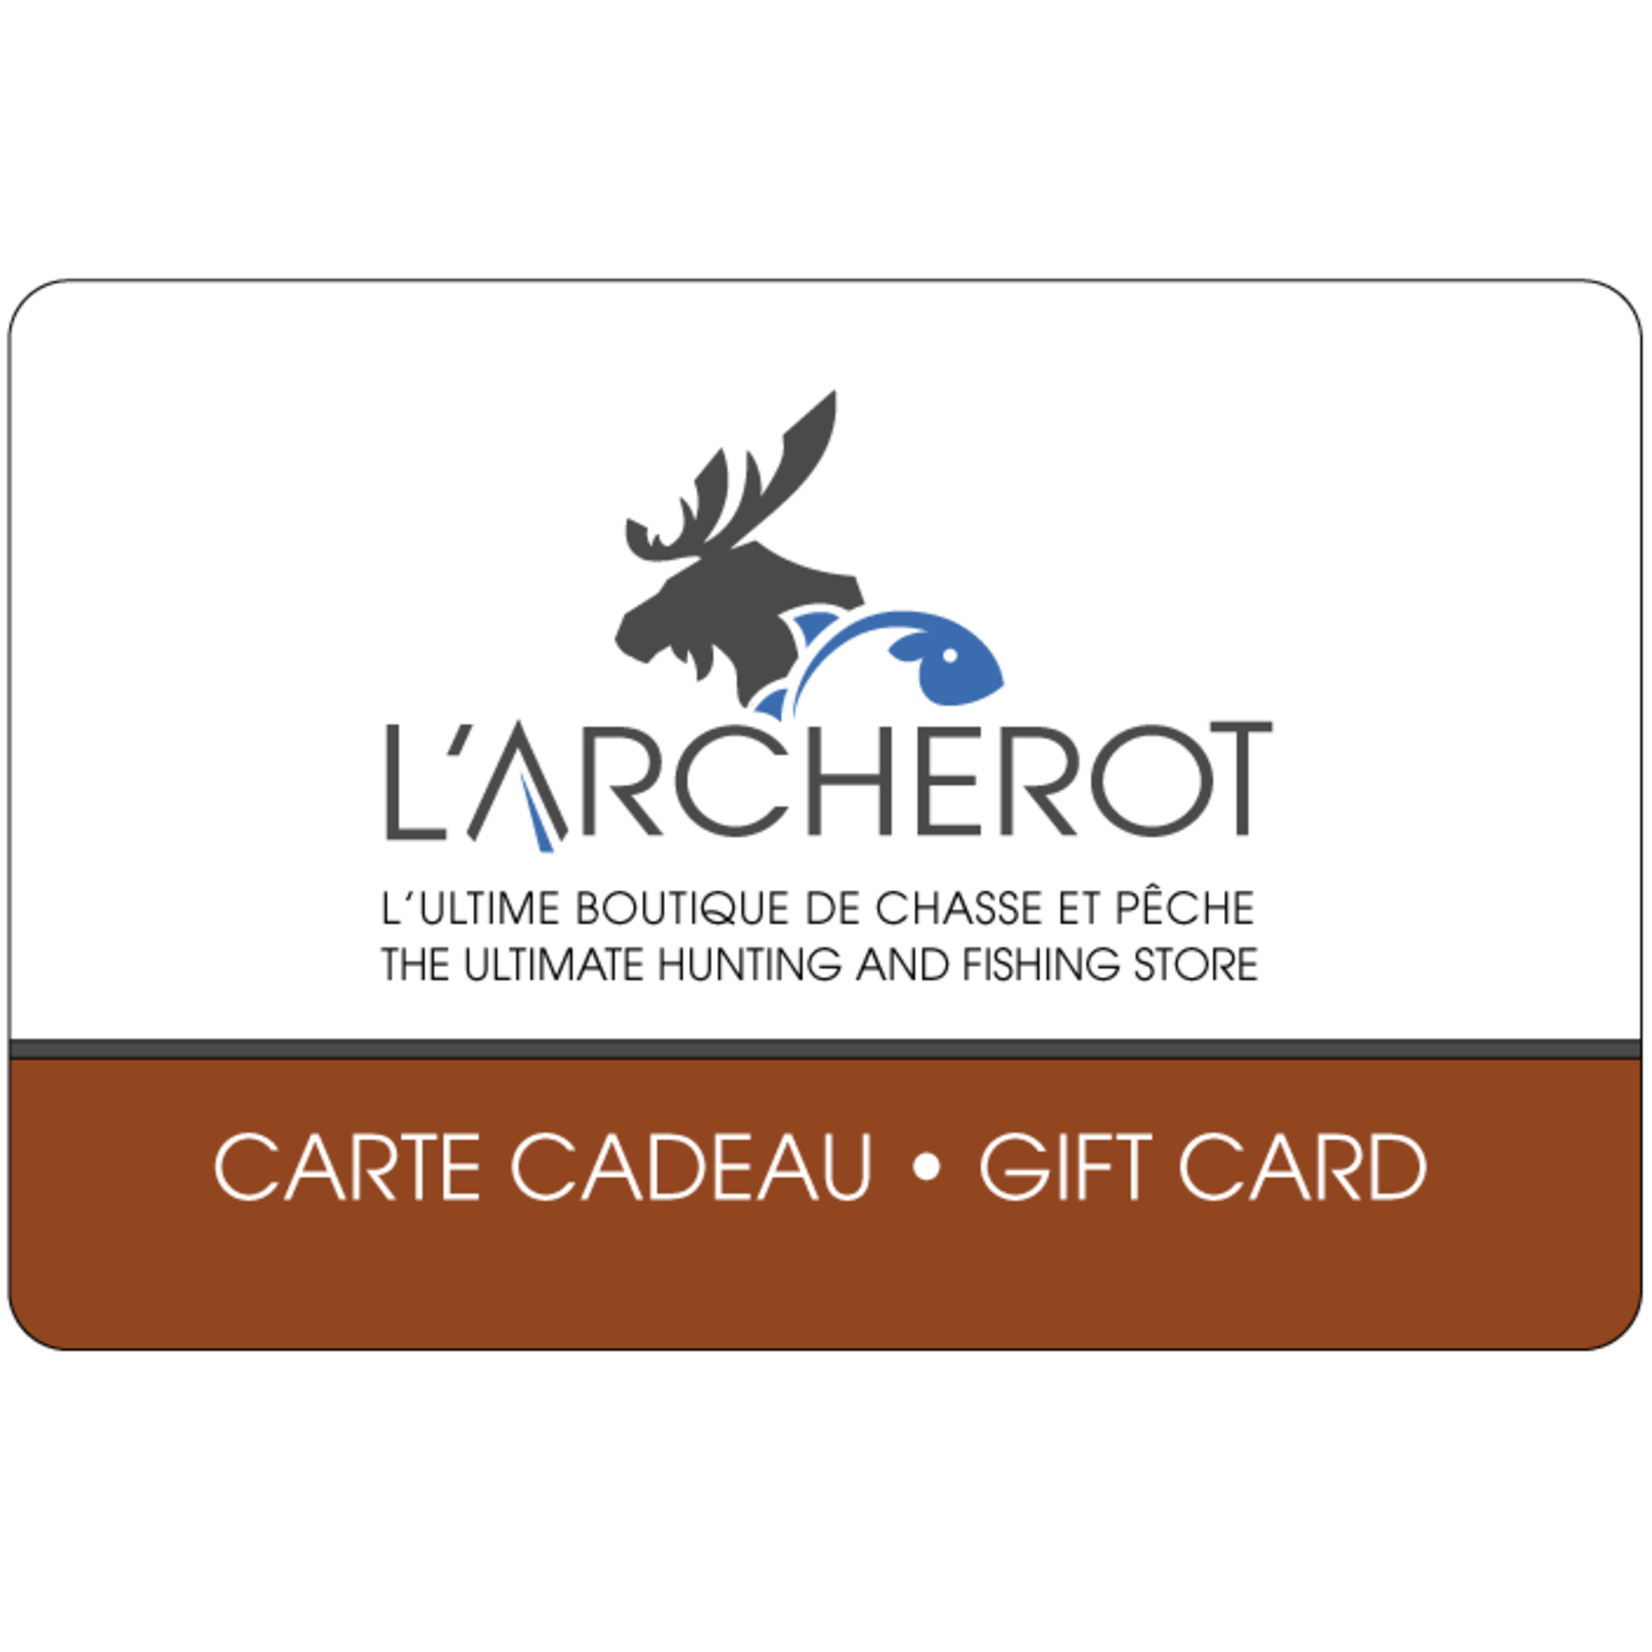 Gift Card - Archerot